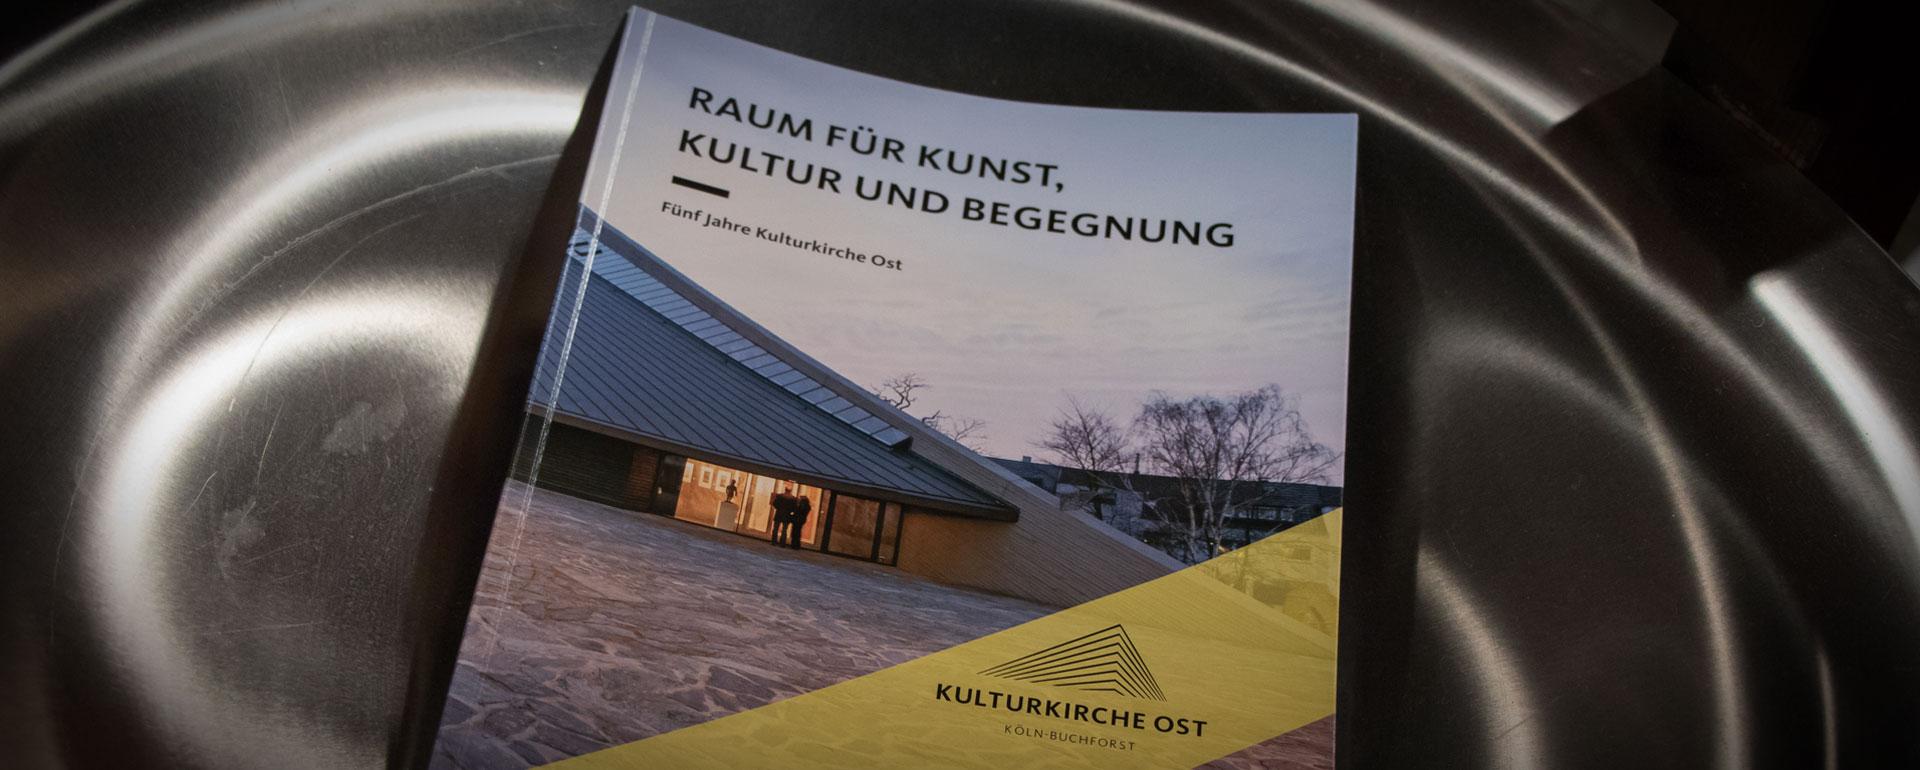 kulturkirche ost gag köln